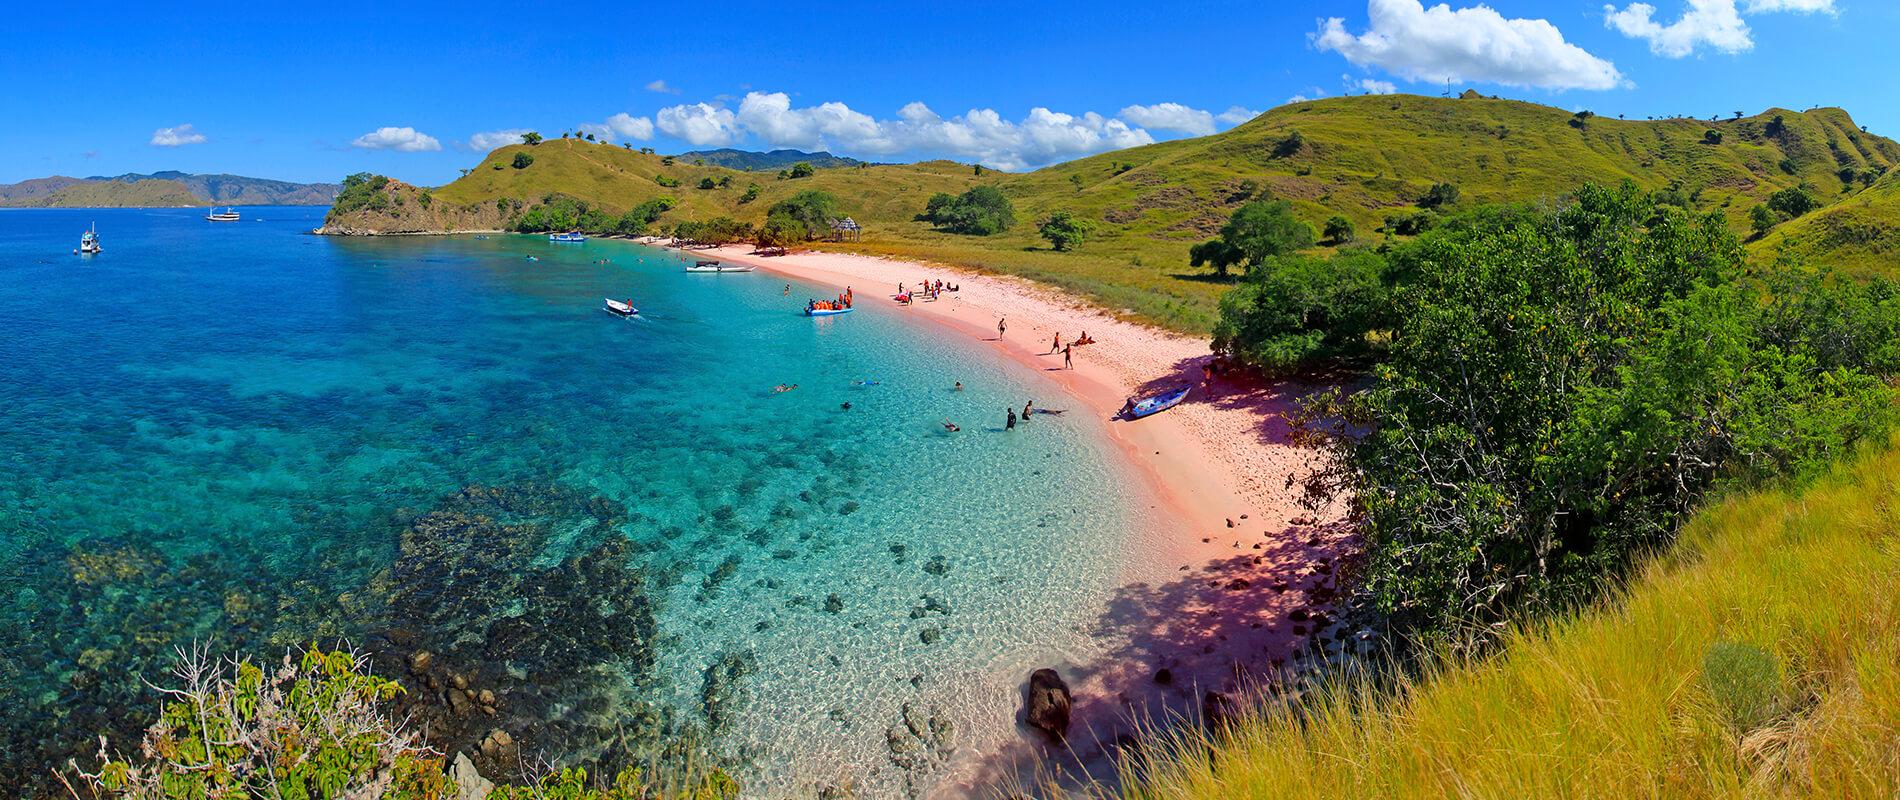 Pantai Merah, the Pink Beach of Indonesia